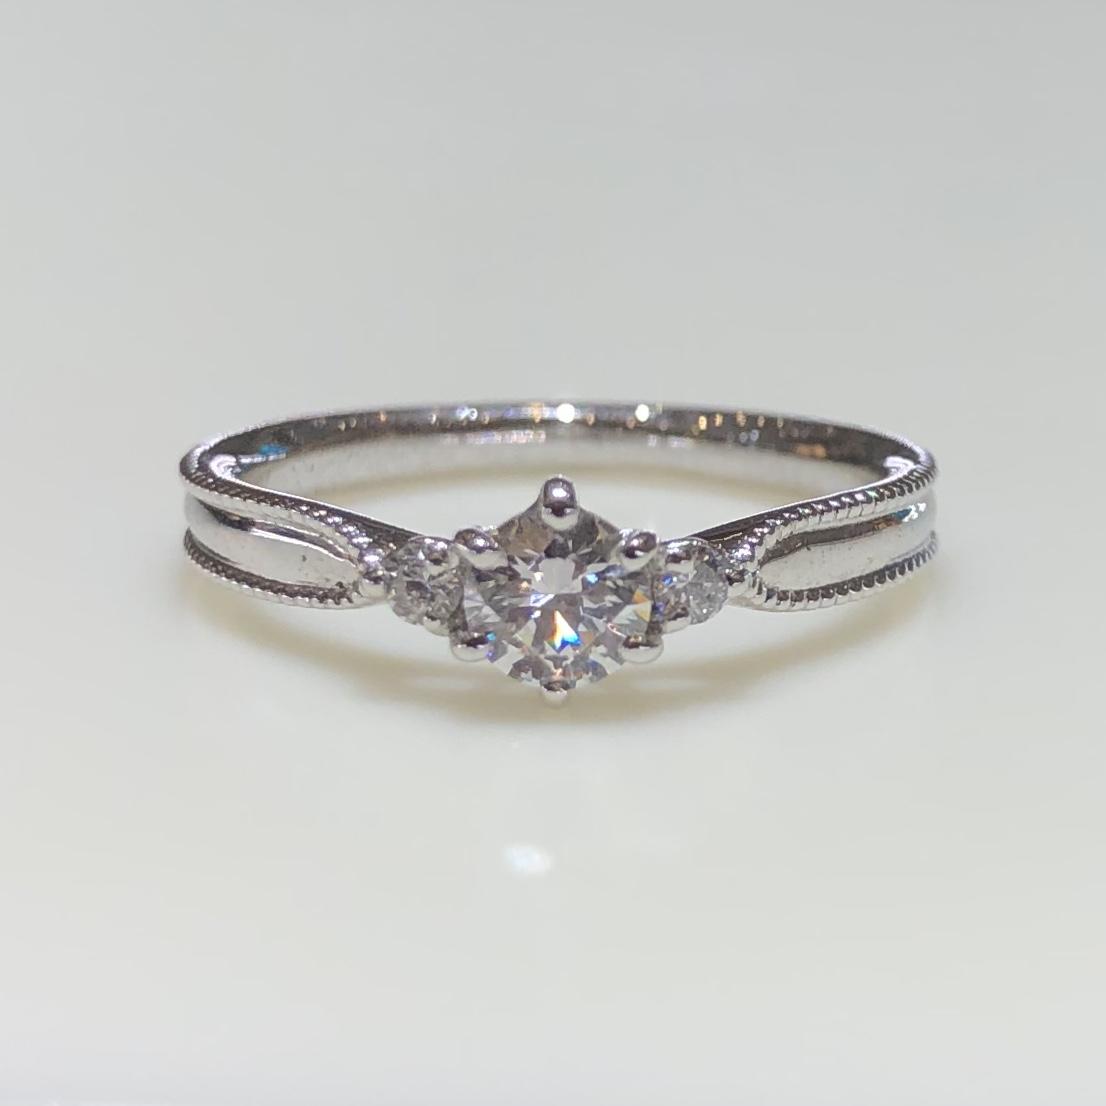 BROOCH 婚約指輪 エンゲージリング 両サイドメレミル打ちデザイン